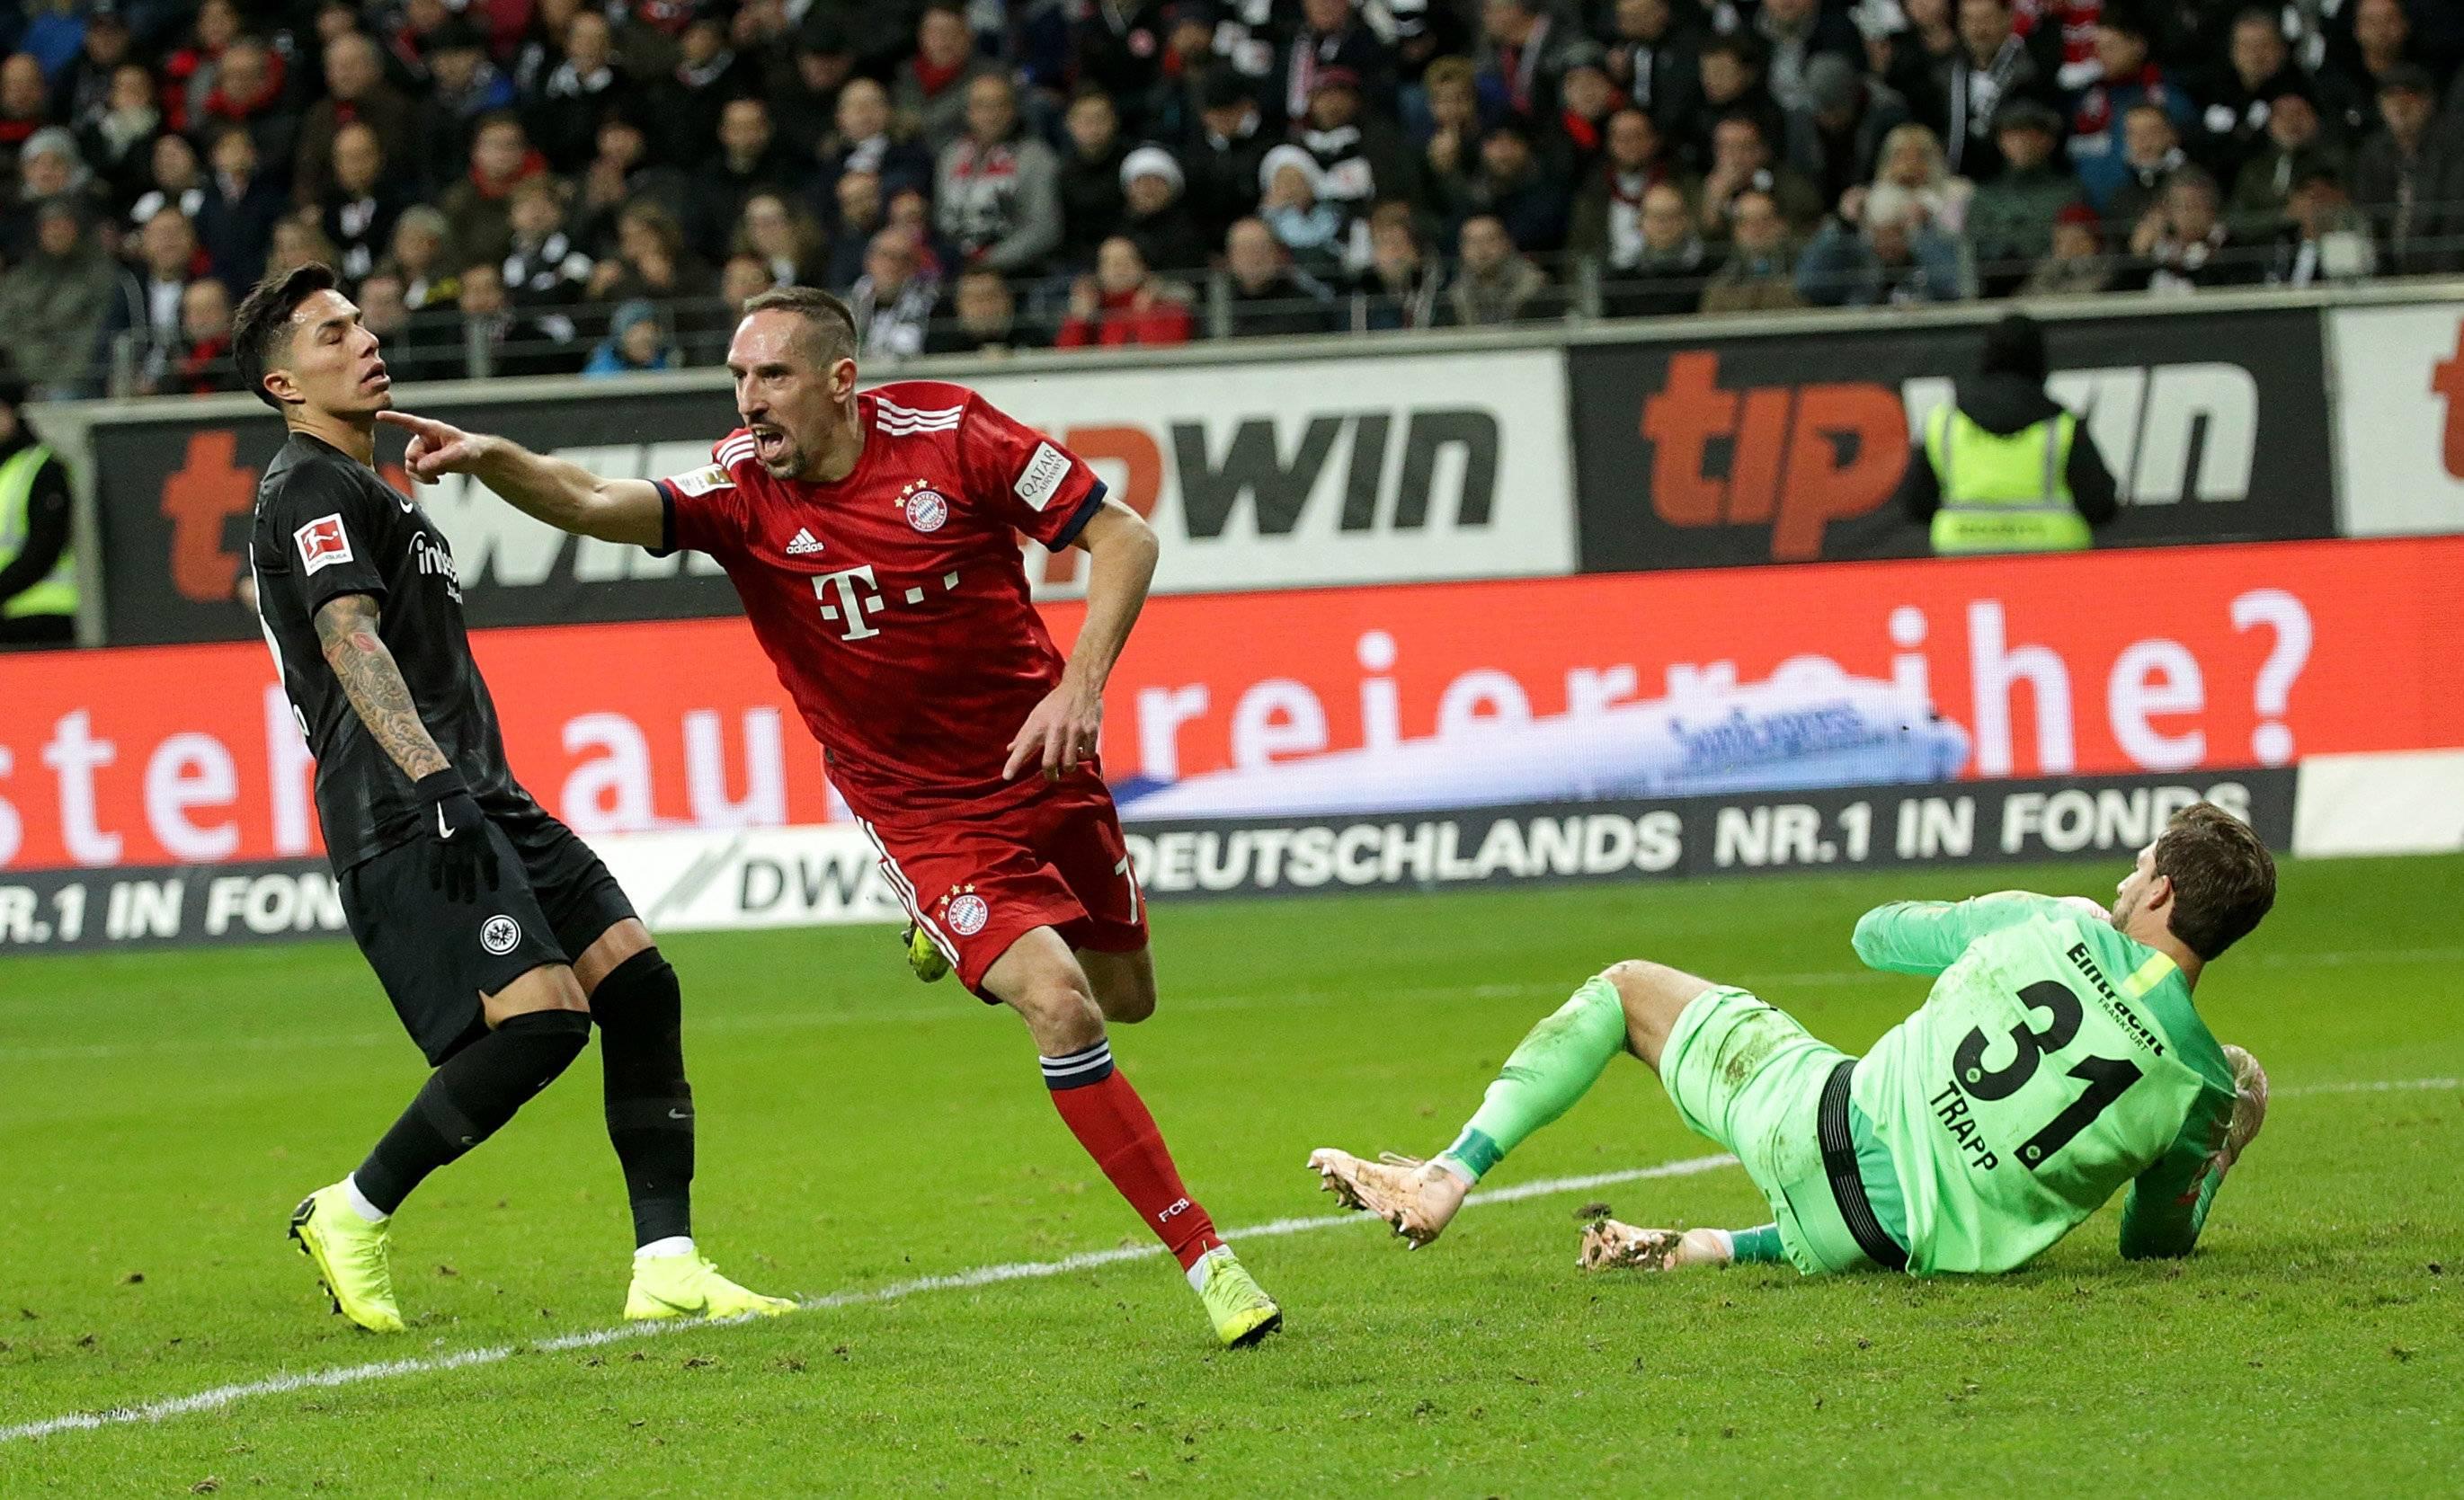 Restprogramm Bayern Dortmund